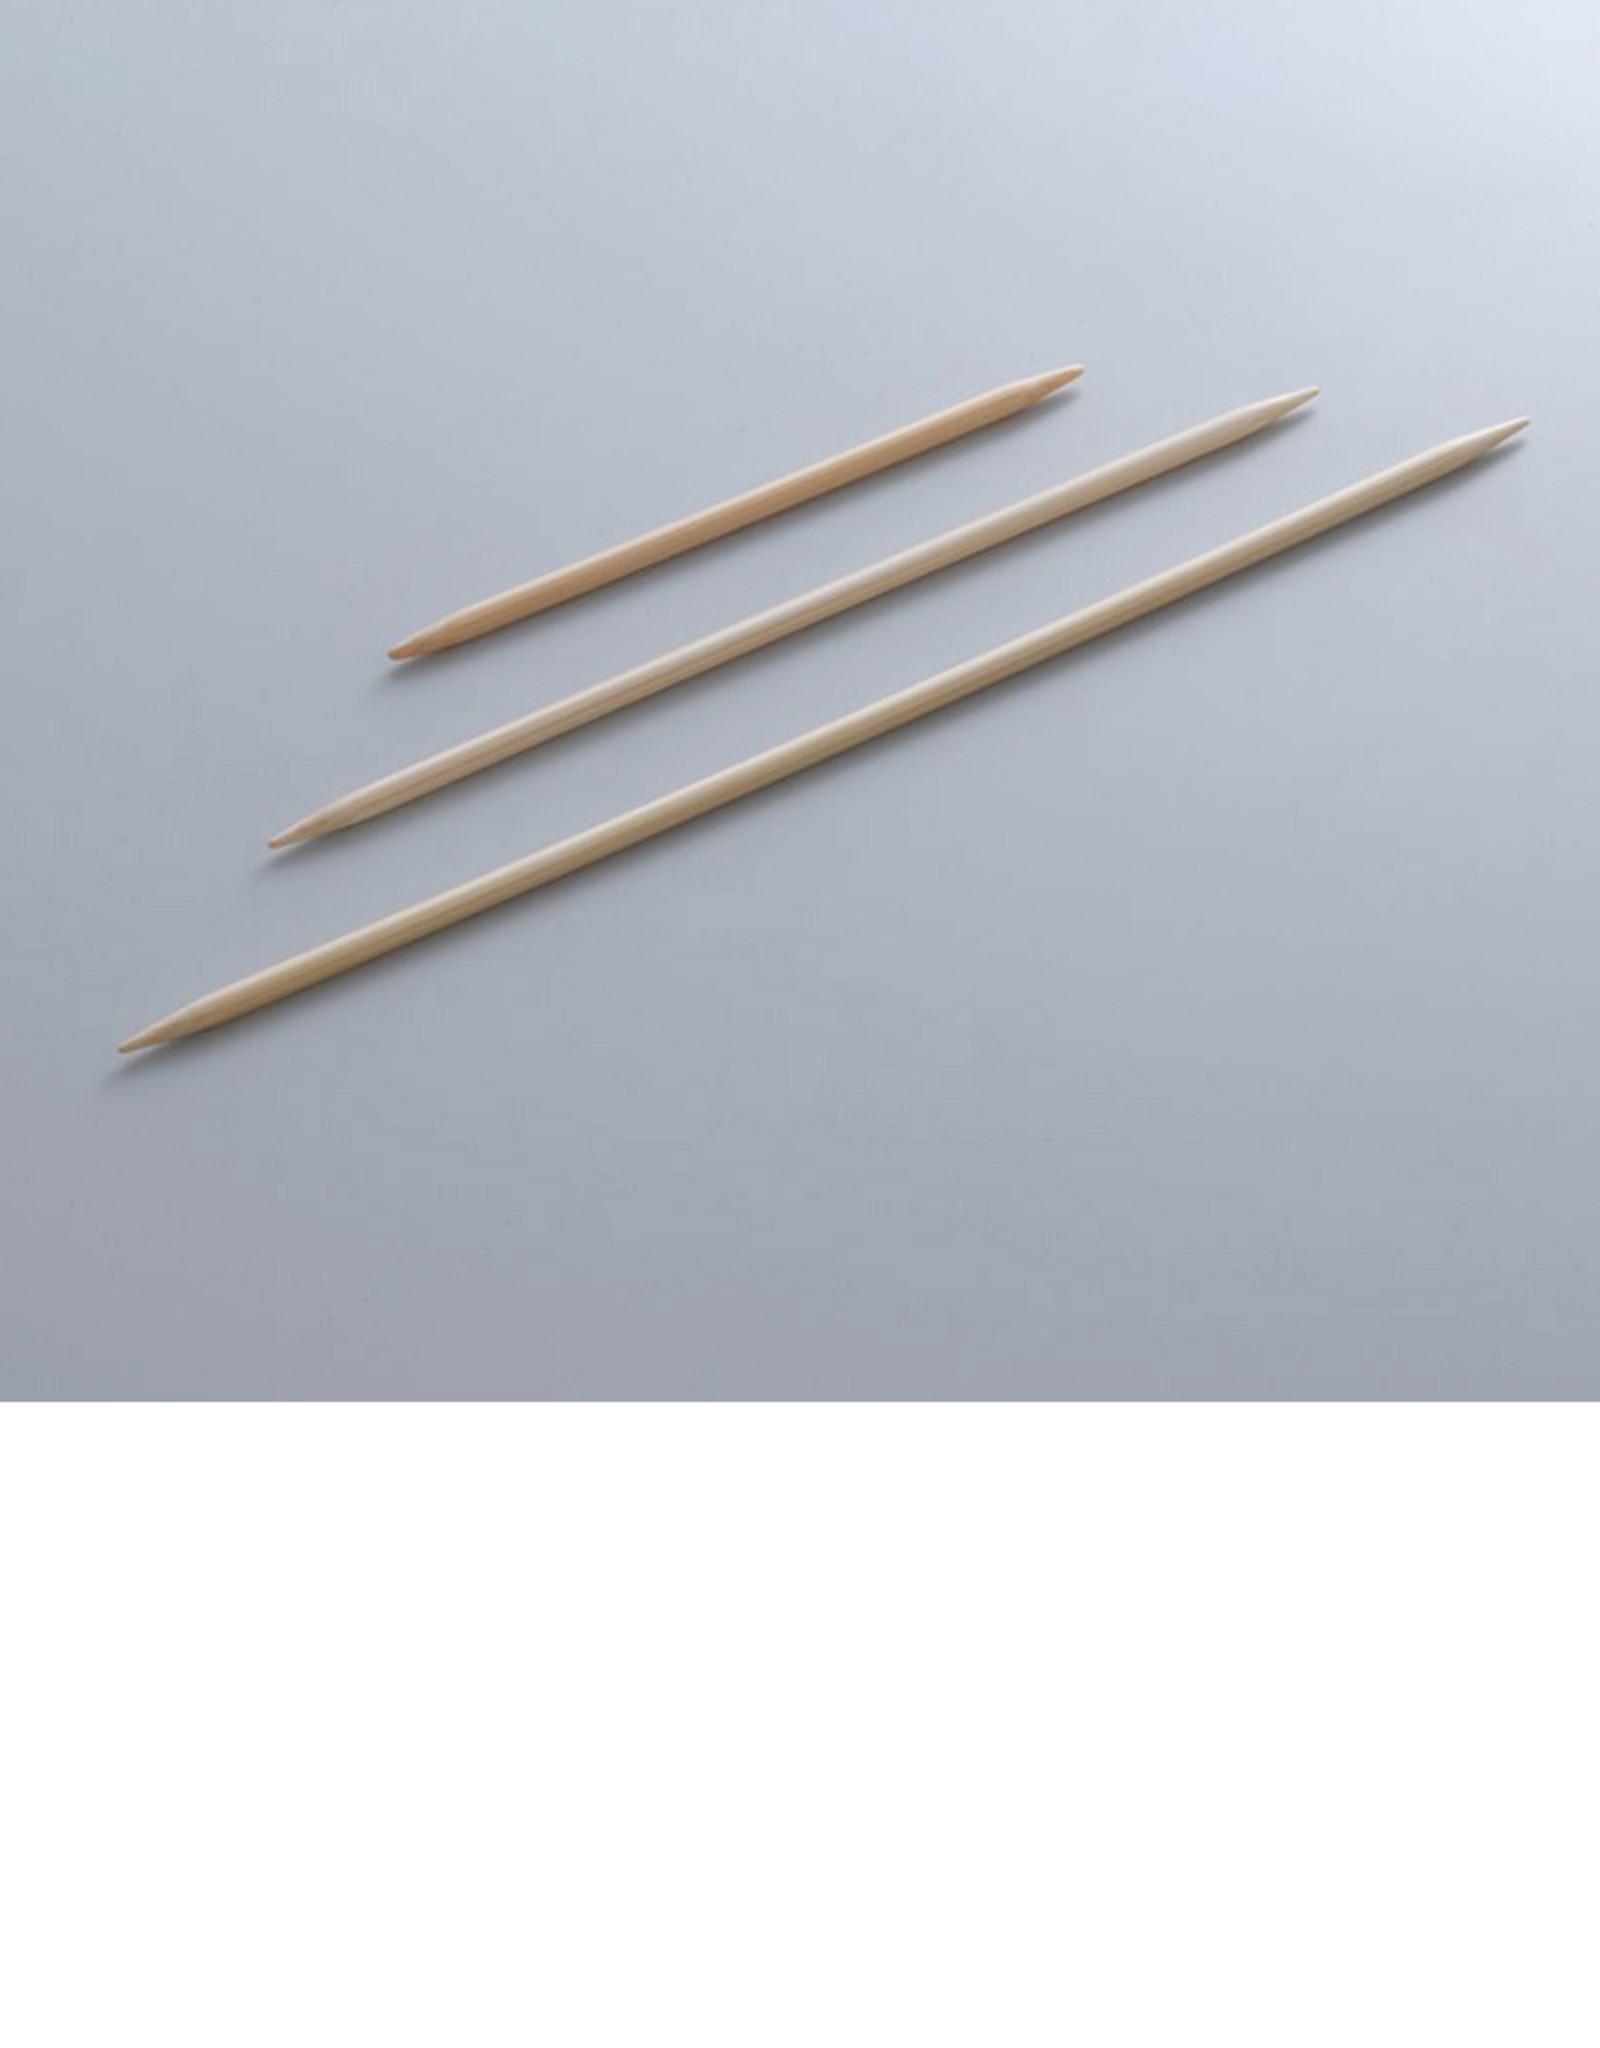 Kinki Amibari KA Double Point Needles US 8